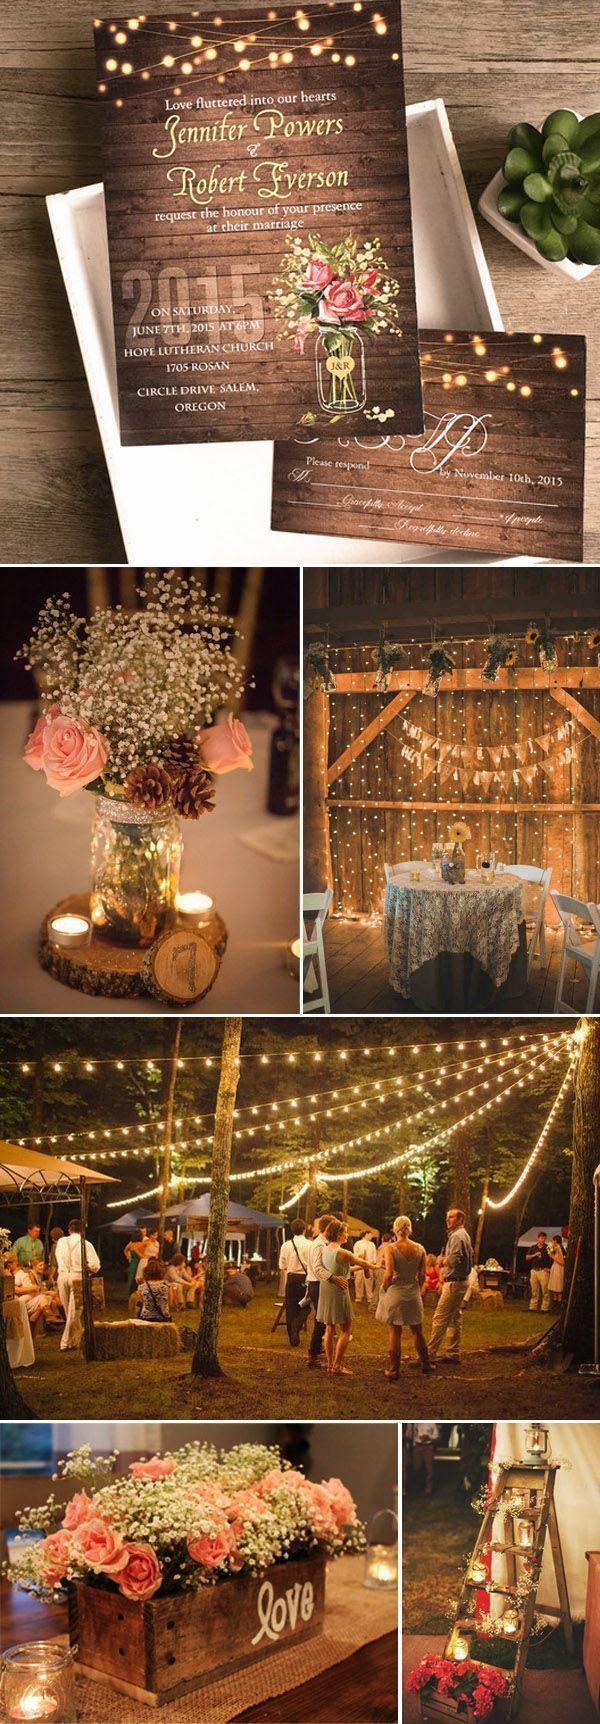 wedding reception invites%0A Seven Popular Rustic Wedding Invitation Styles for      Spring  u     Summer  Weddings